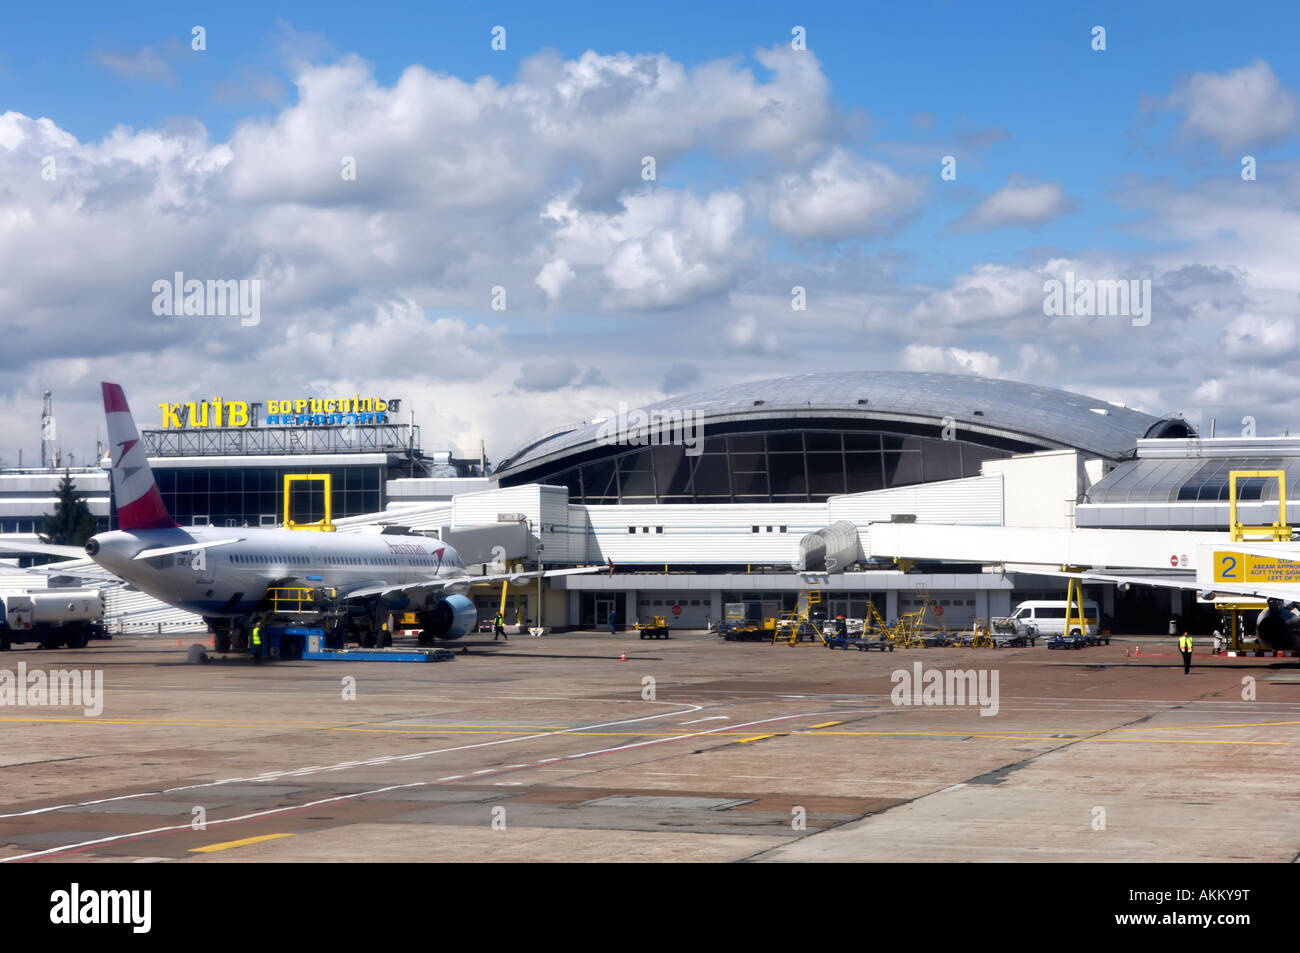 Aeroporto Kiev : Ukraine eastern europe kiev airport stock photos ukraine eastern